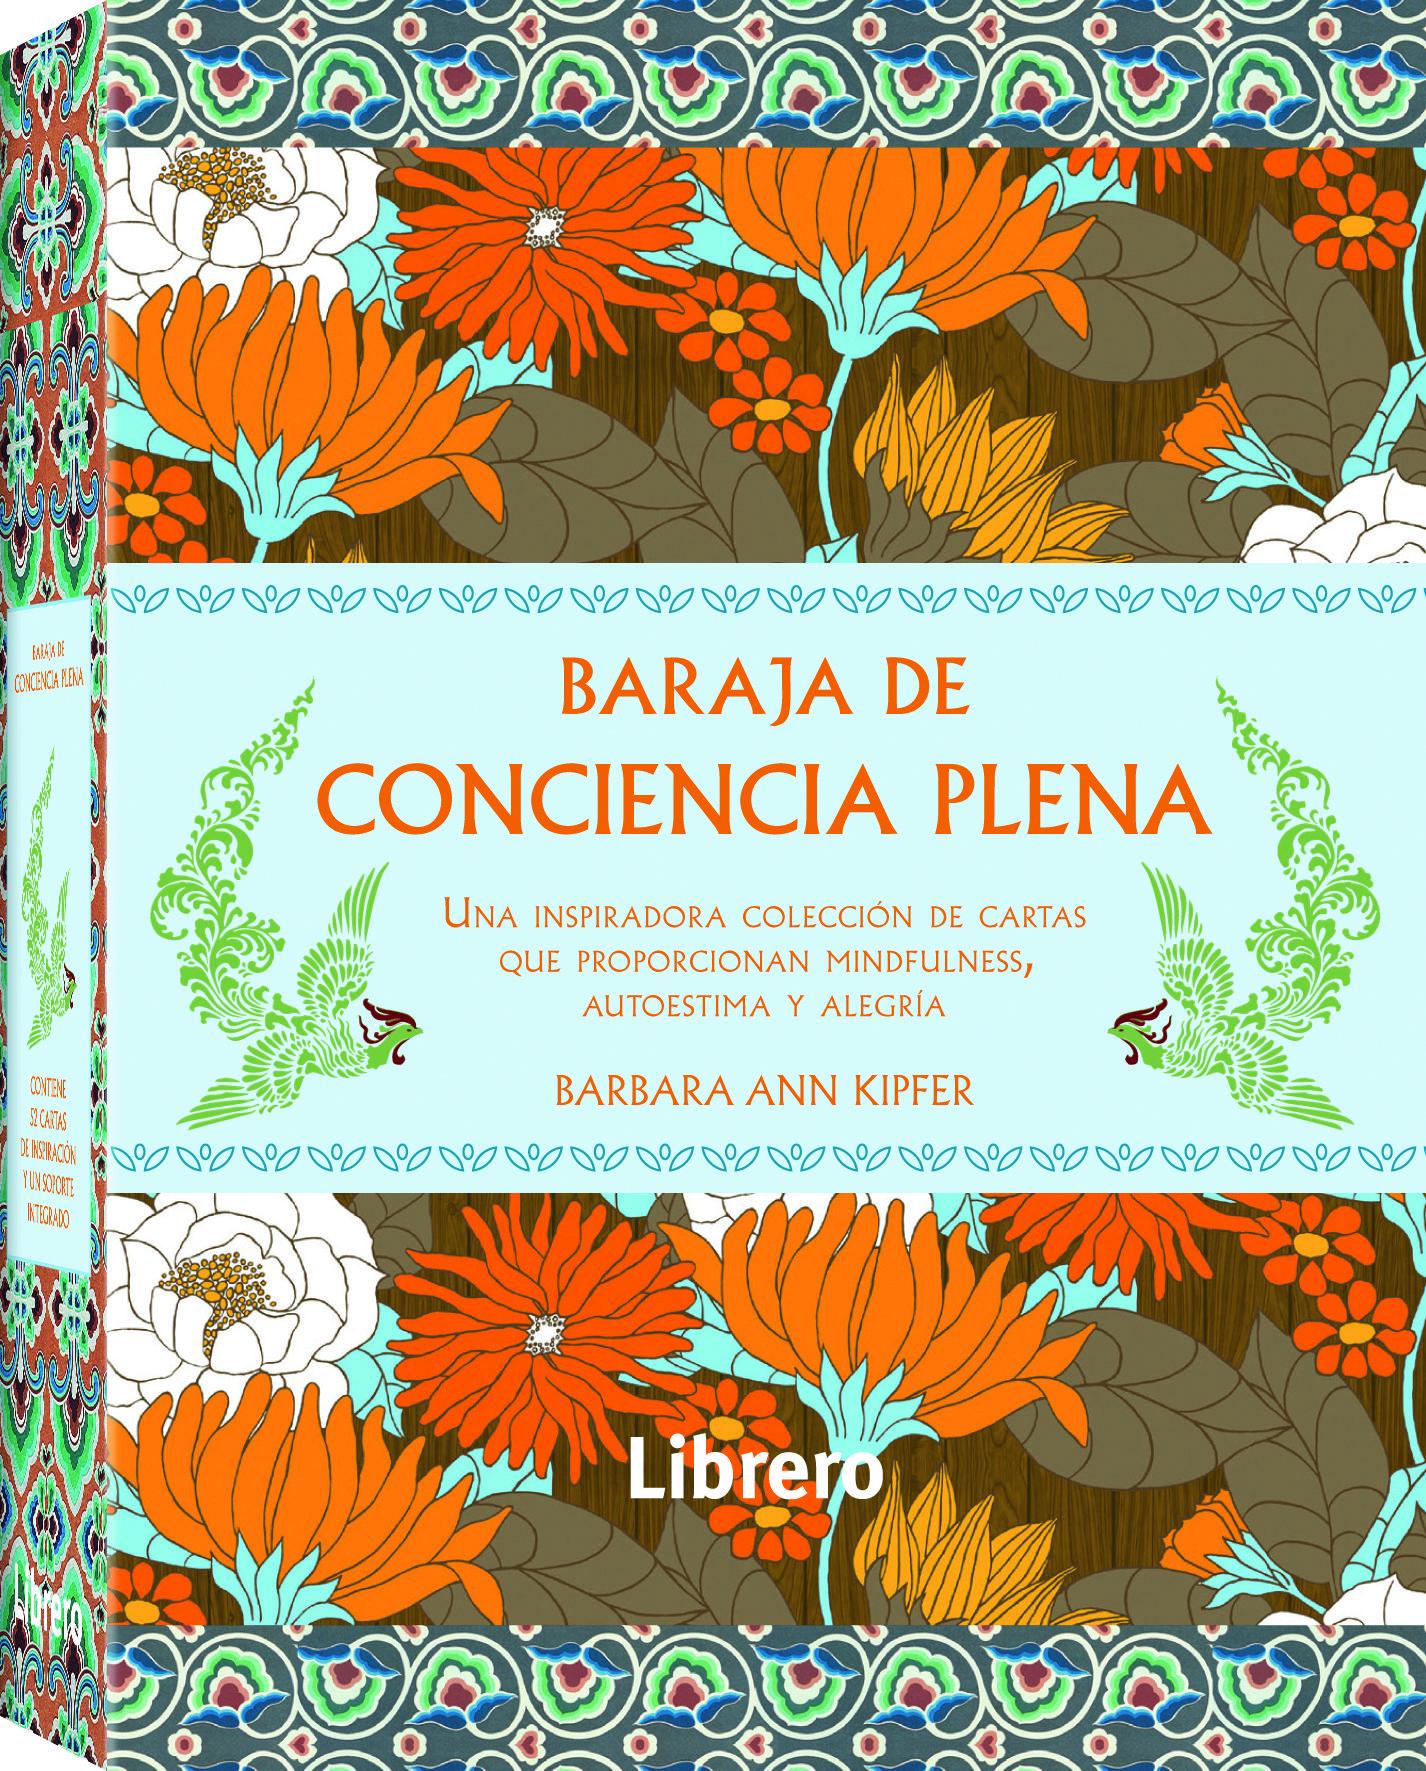 baraja de conciencia plena (mindfulness)-barbara ann kipler-9789089985521